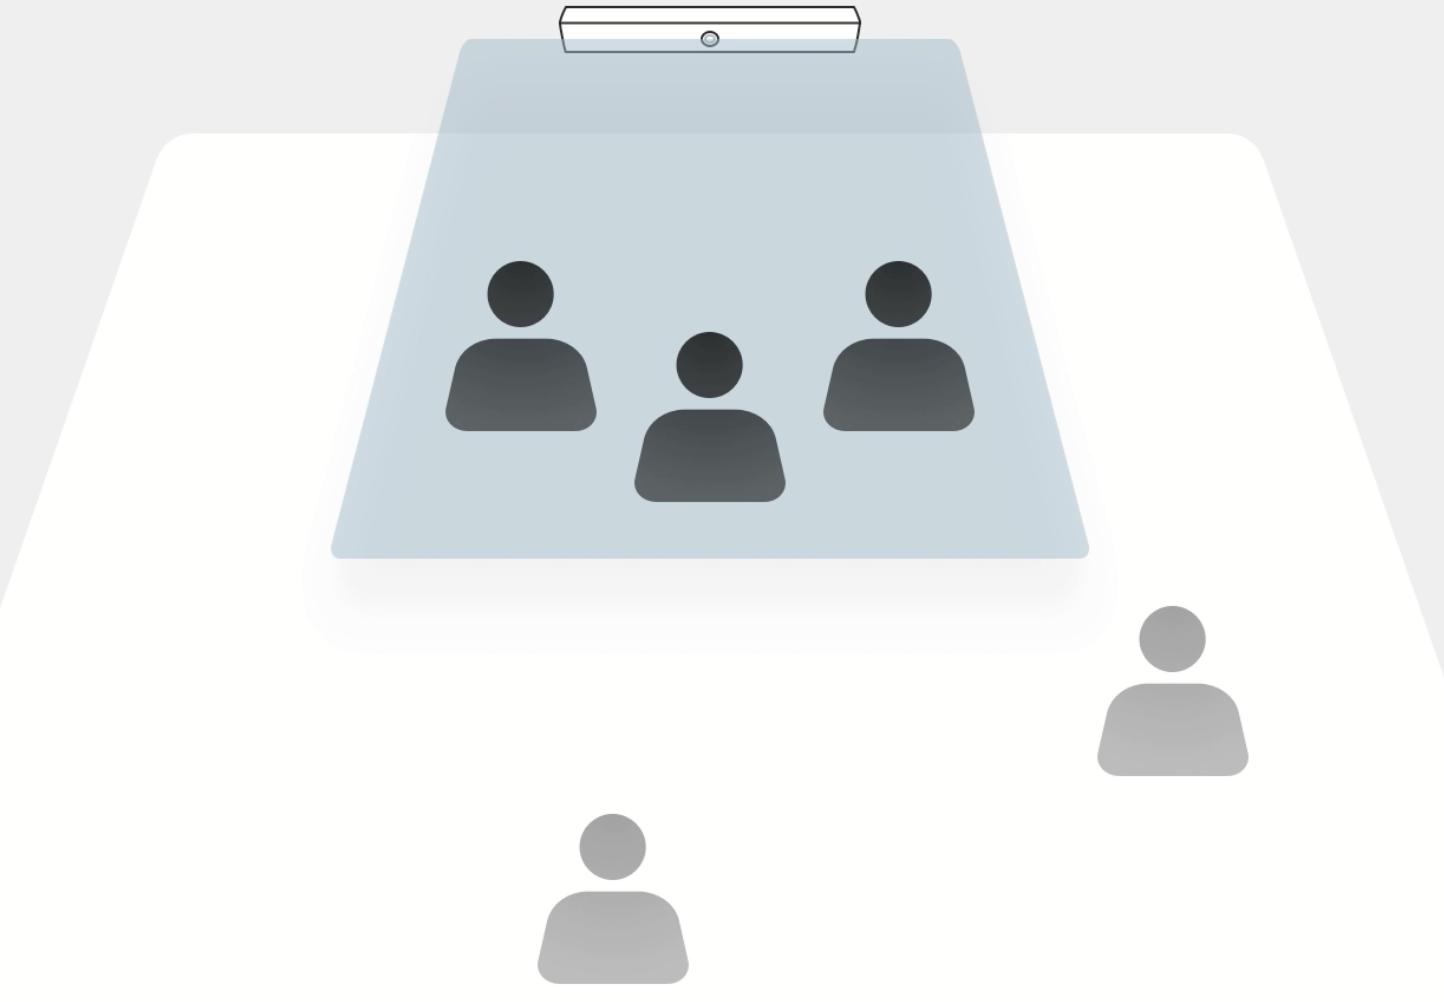 How to configure Auto framing: Subject boundary